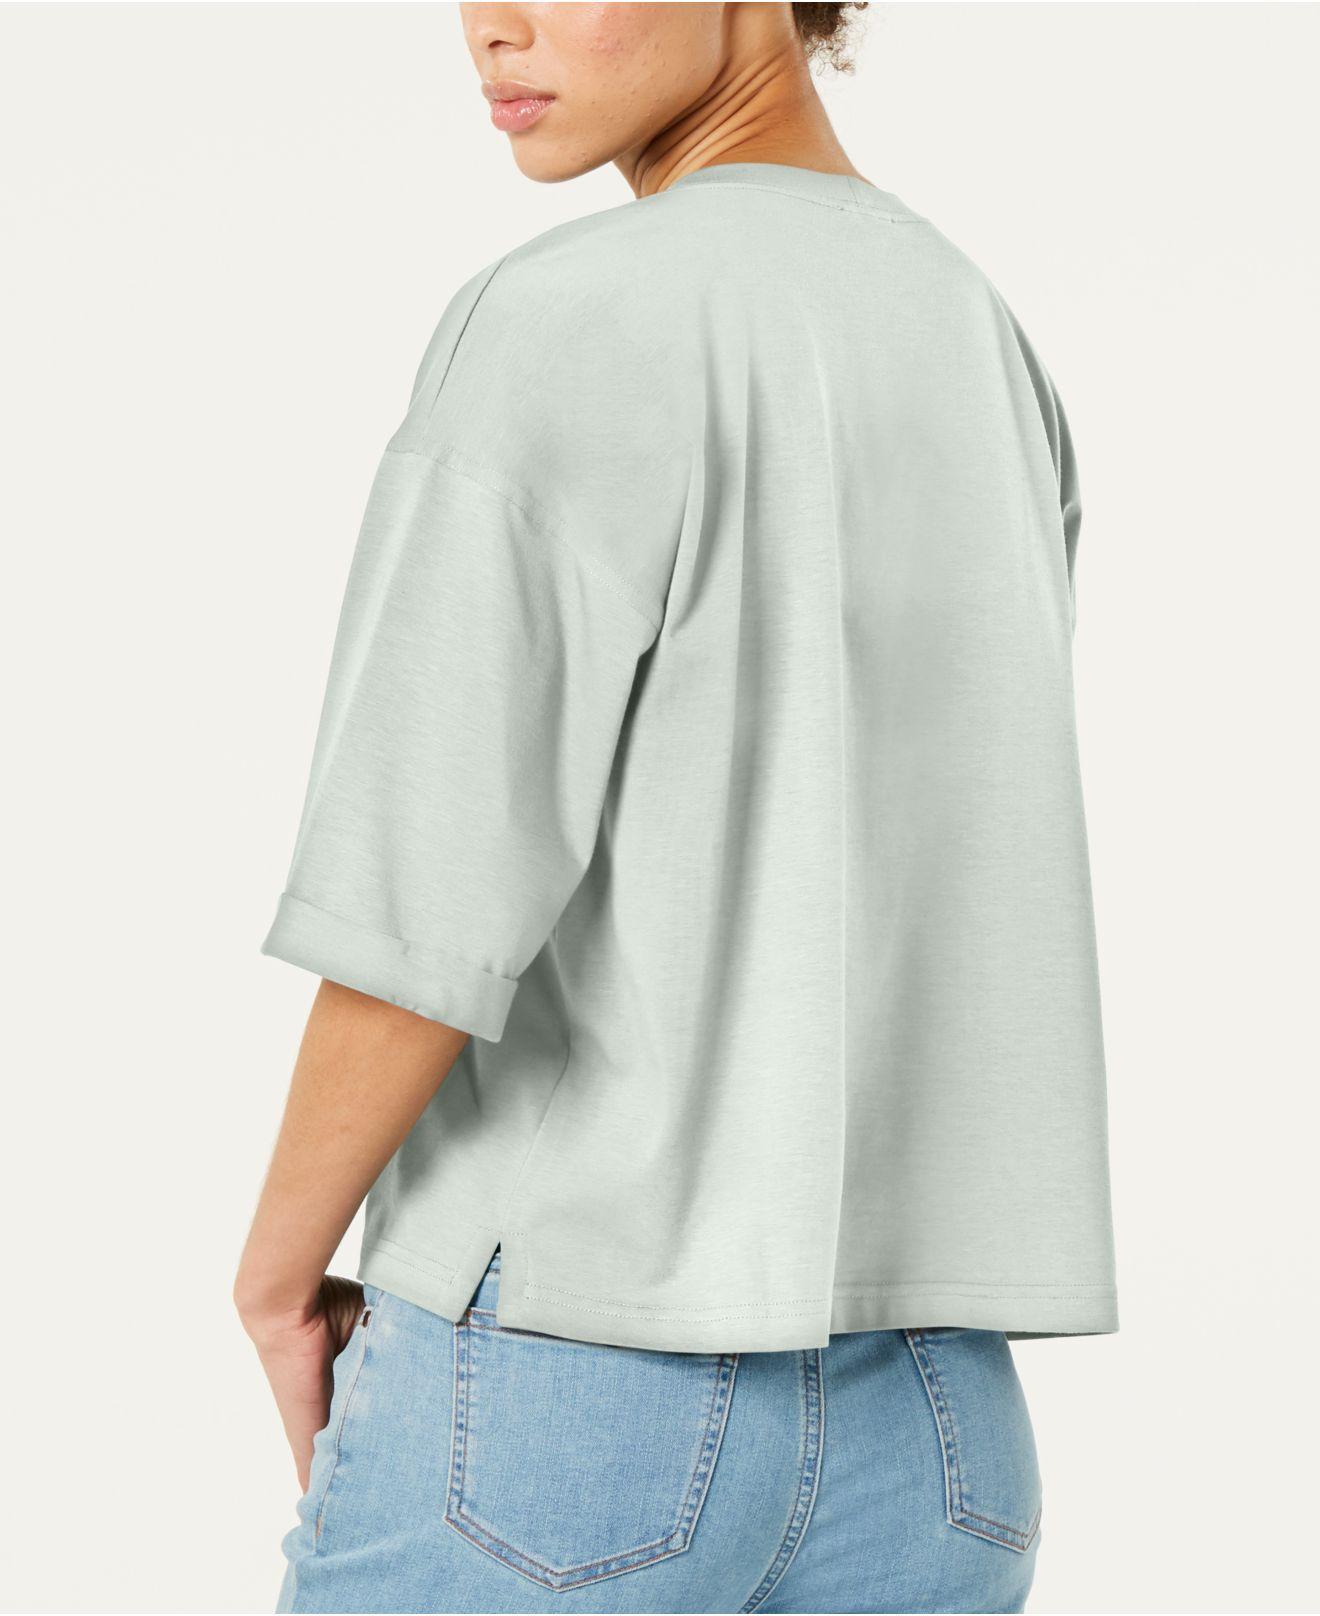 f8a8670364a Lyst - Eileen Fisher Organic Cotton Elbow-sleeve Top, Regular & Petite